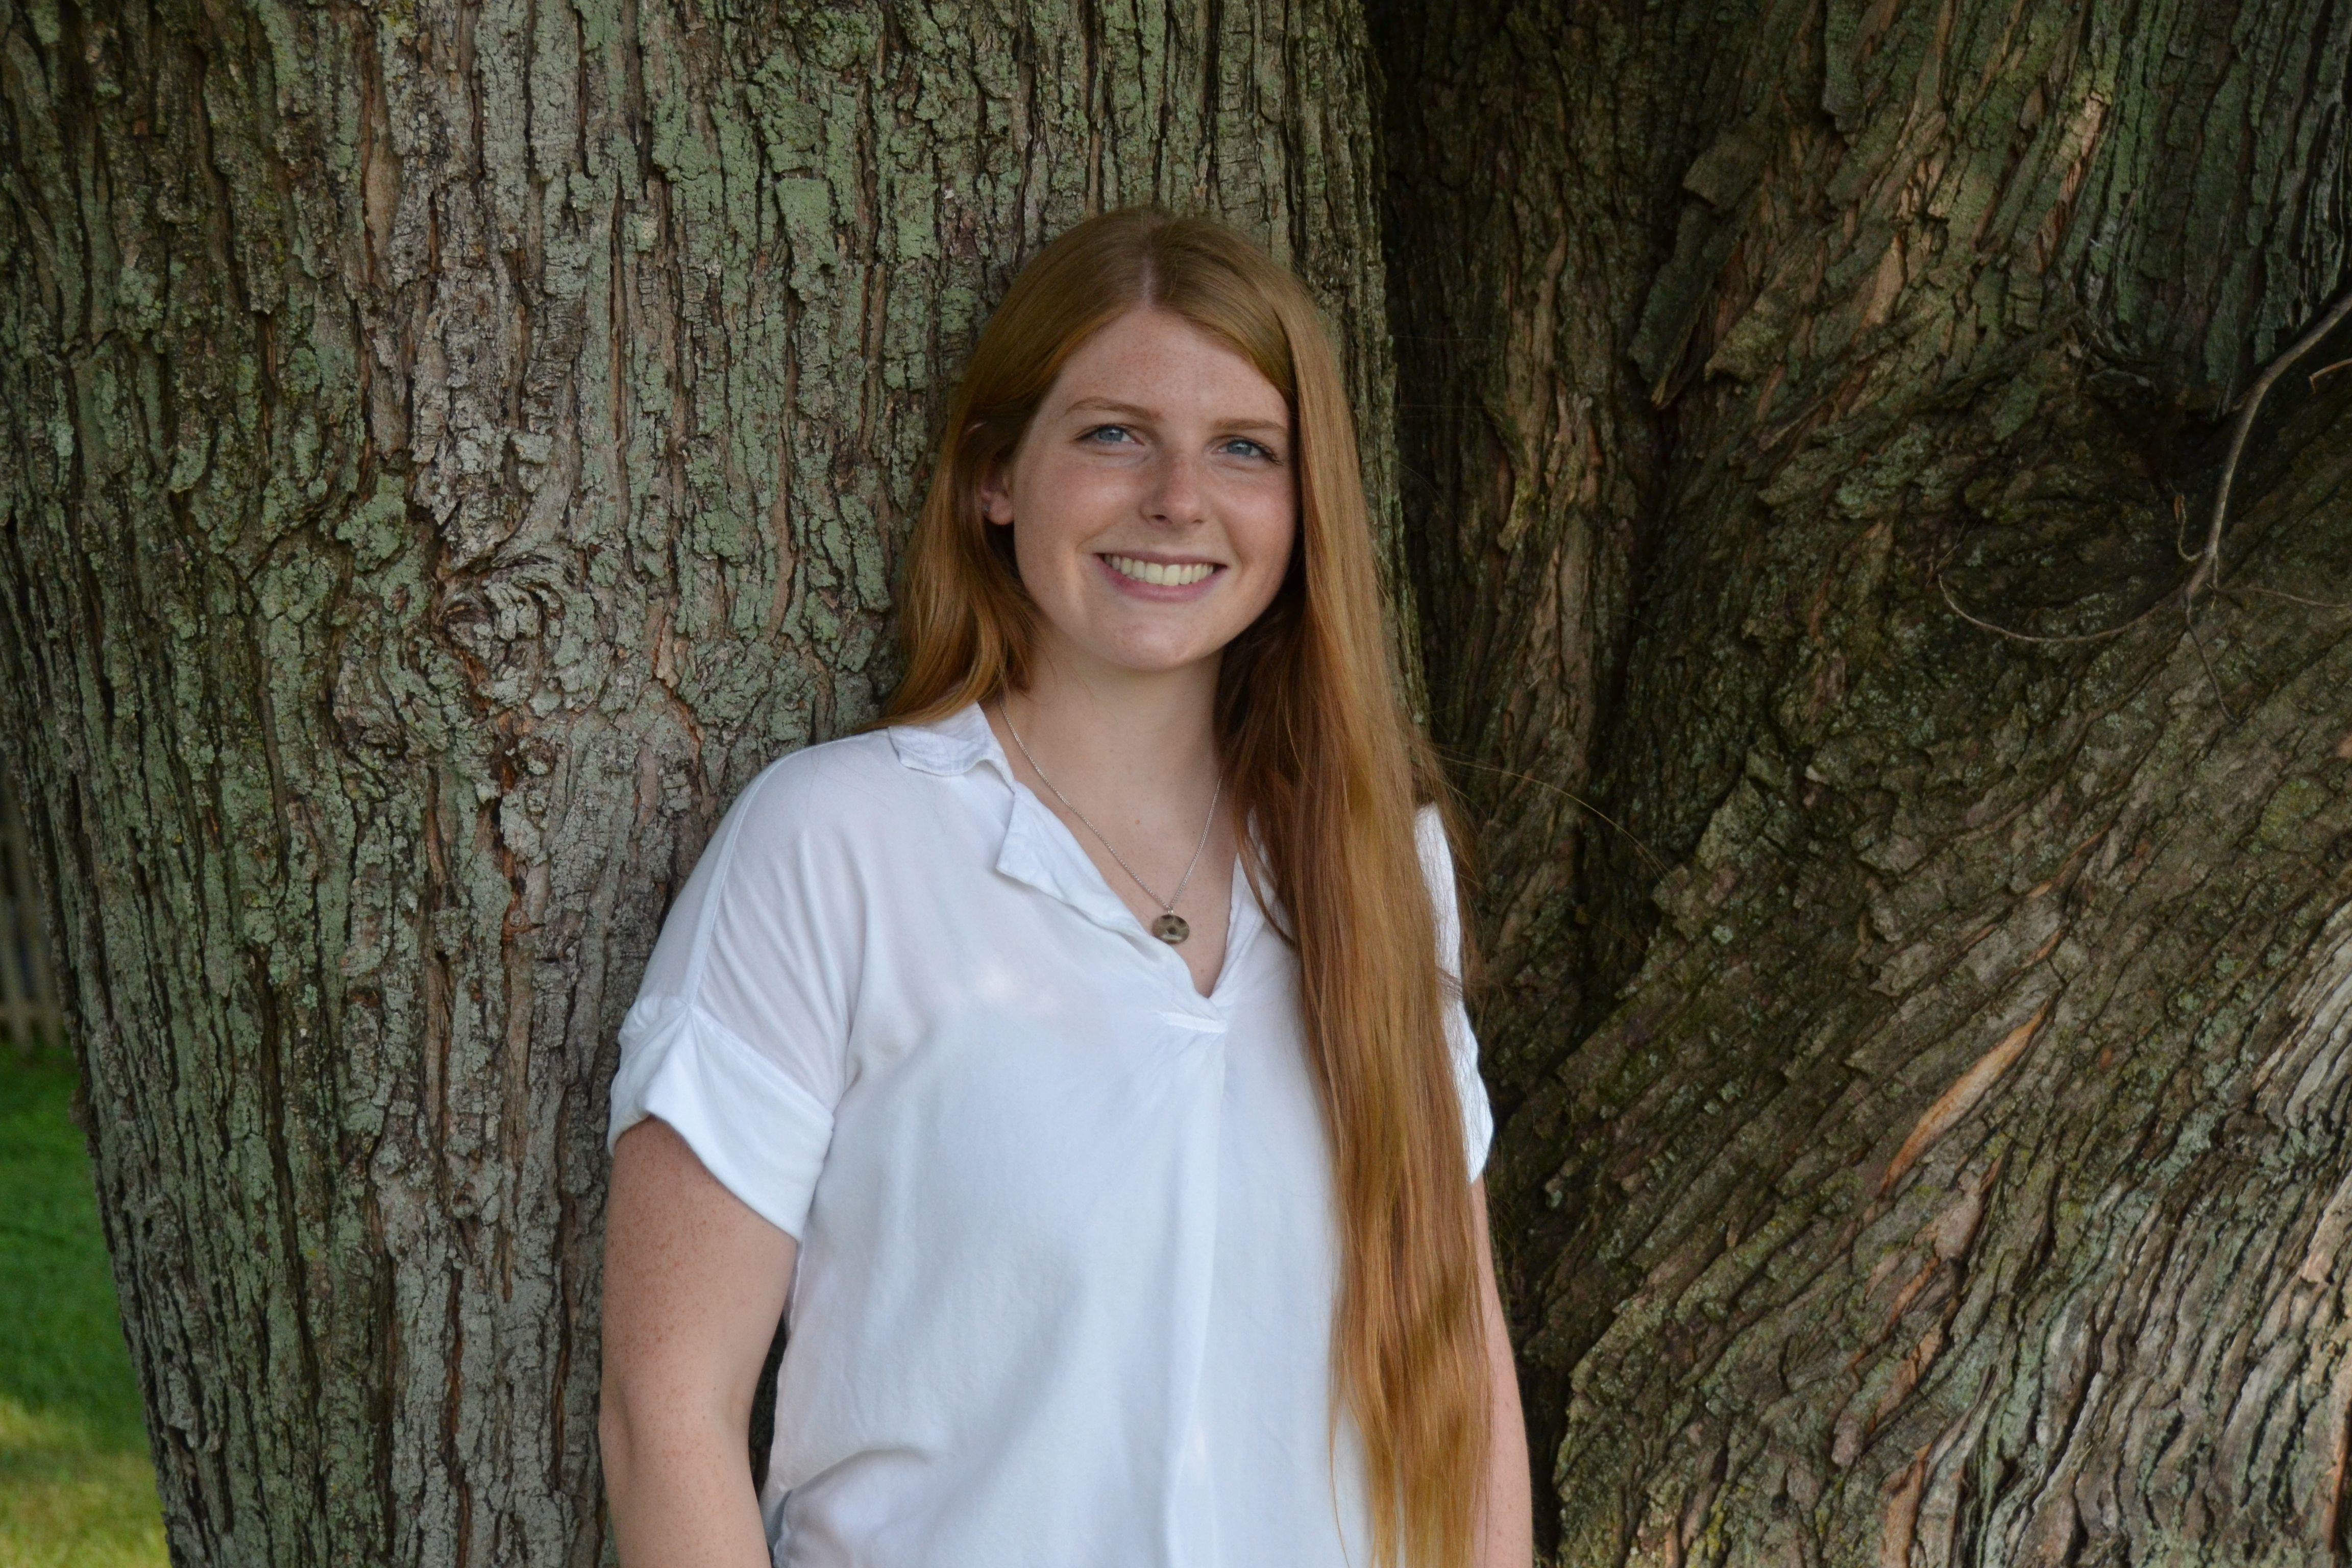 Madison Wisniewski, District Urban Technician